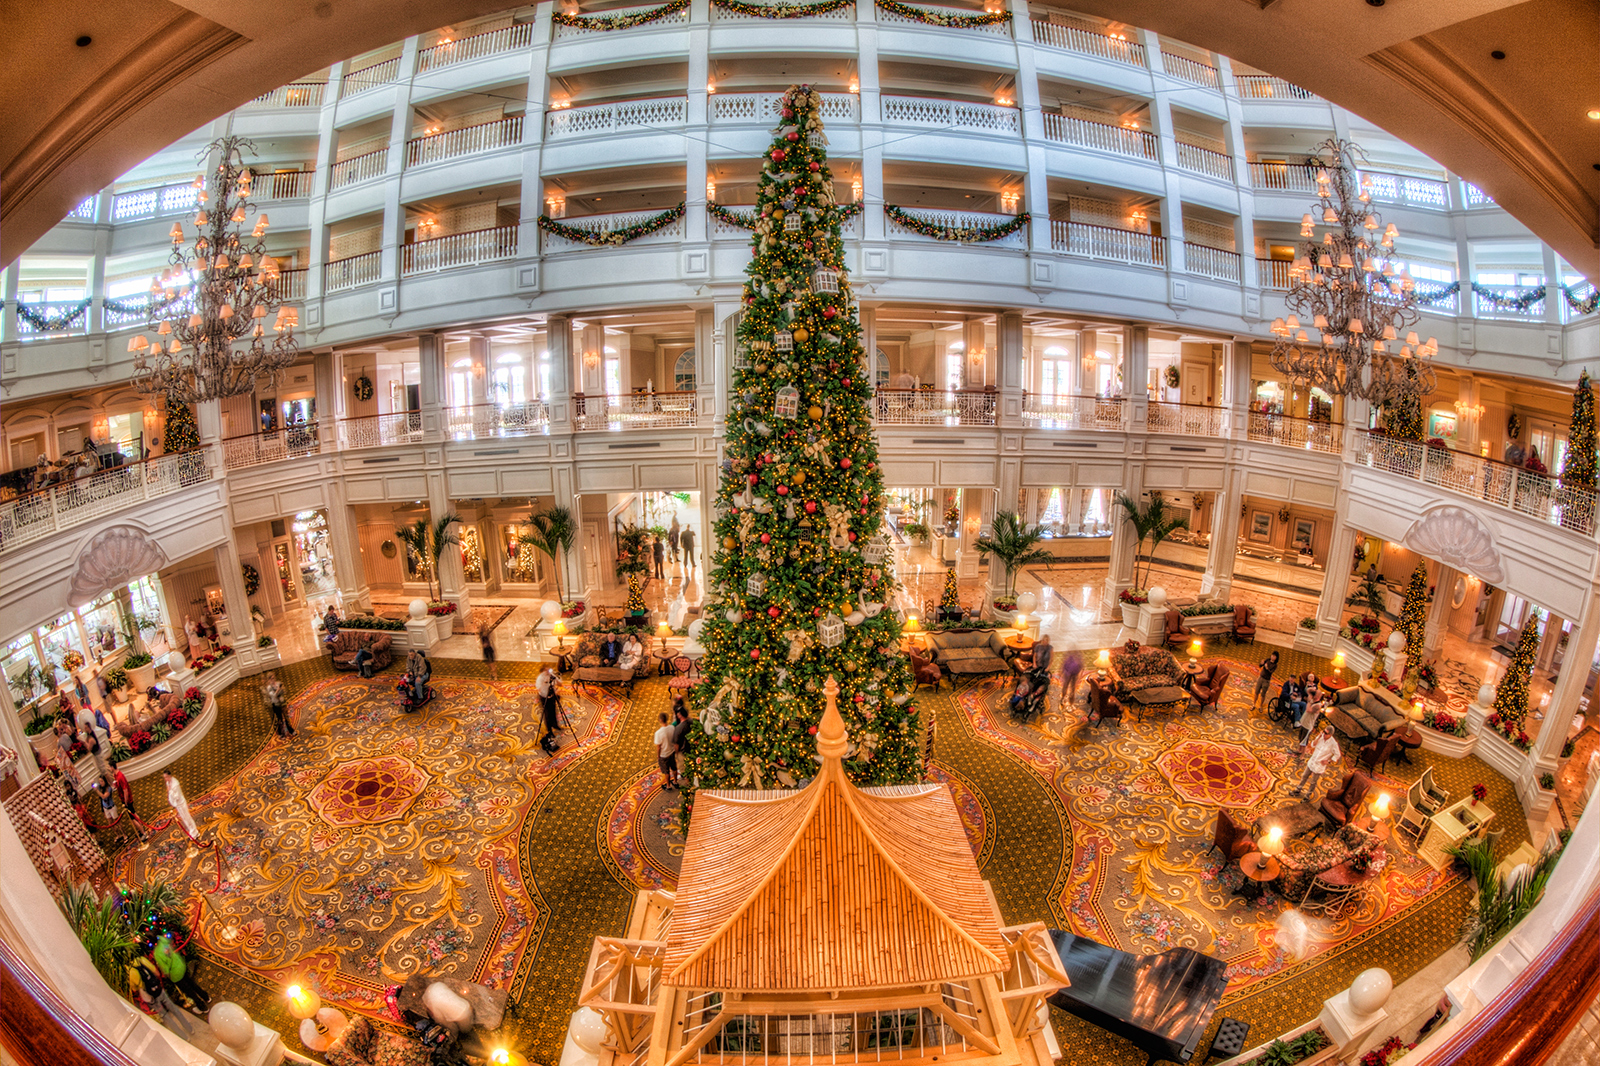 Grand Floridian Hotel Lobby Fisheye at Christmas